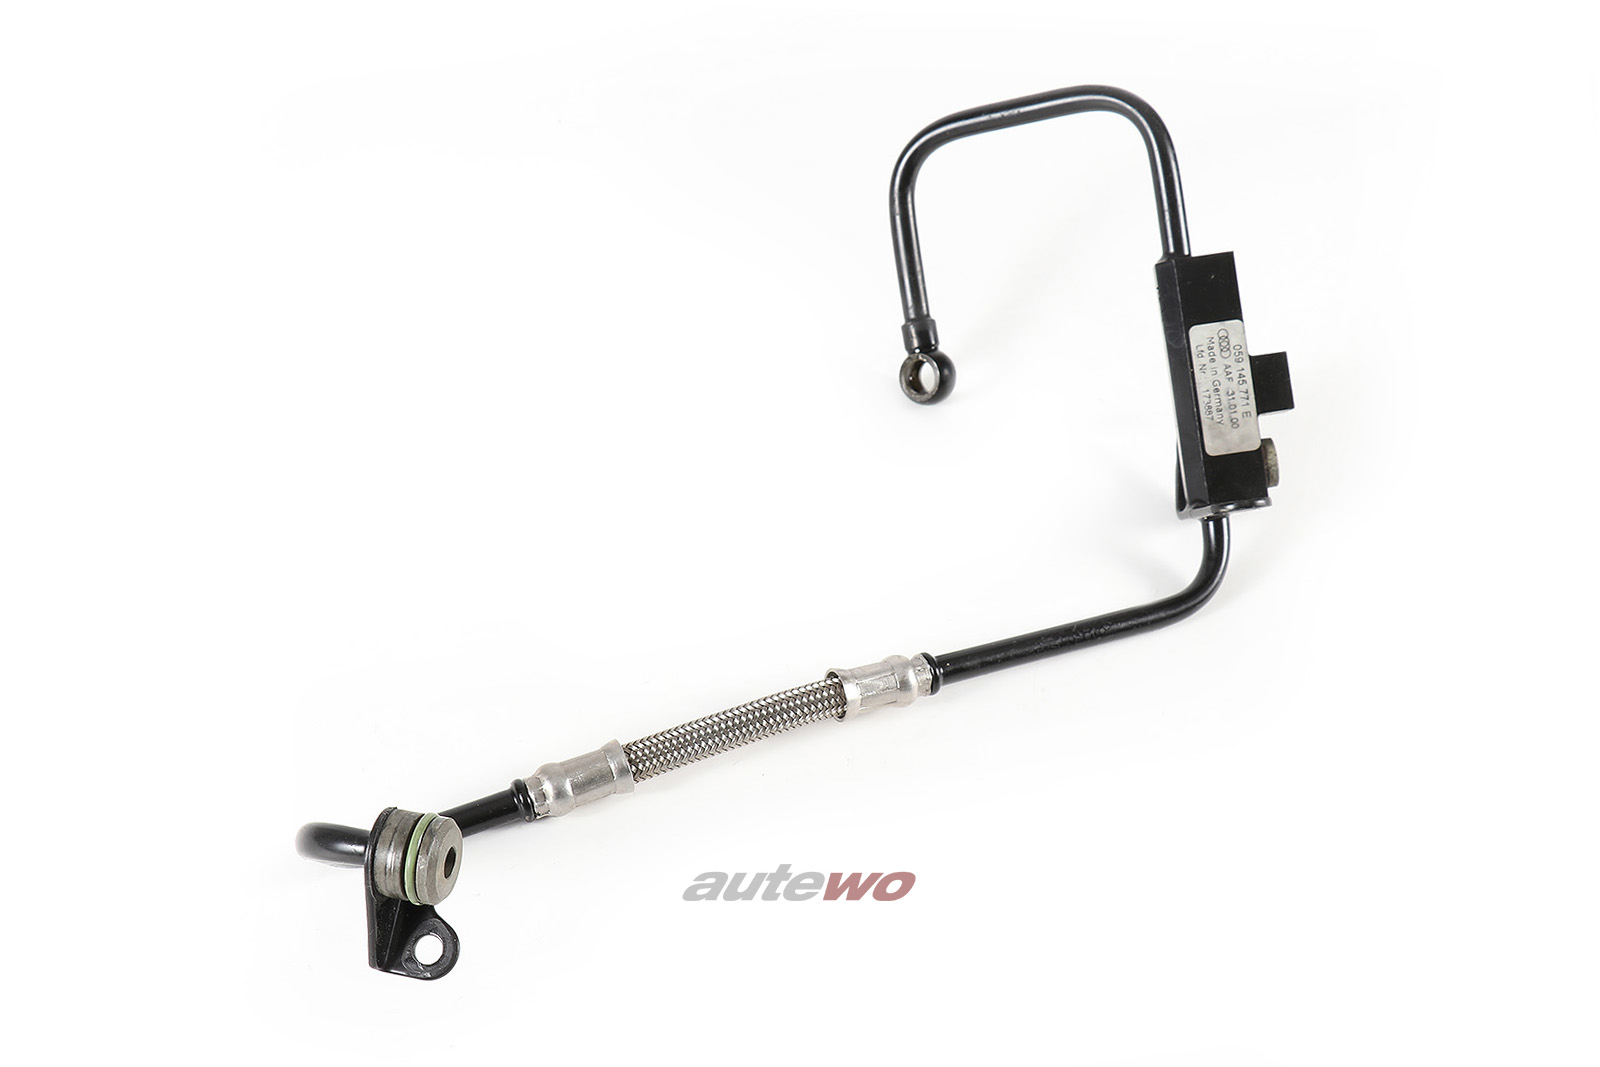 059145771E Audi/VW A4 B5/A6 4B/A8 D2/Passat 2.5l TDI Turbolader Vorlaufleitung